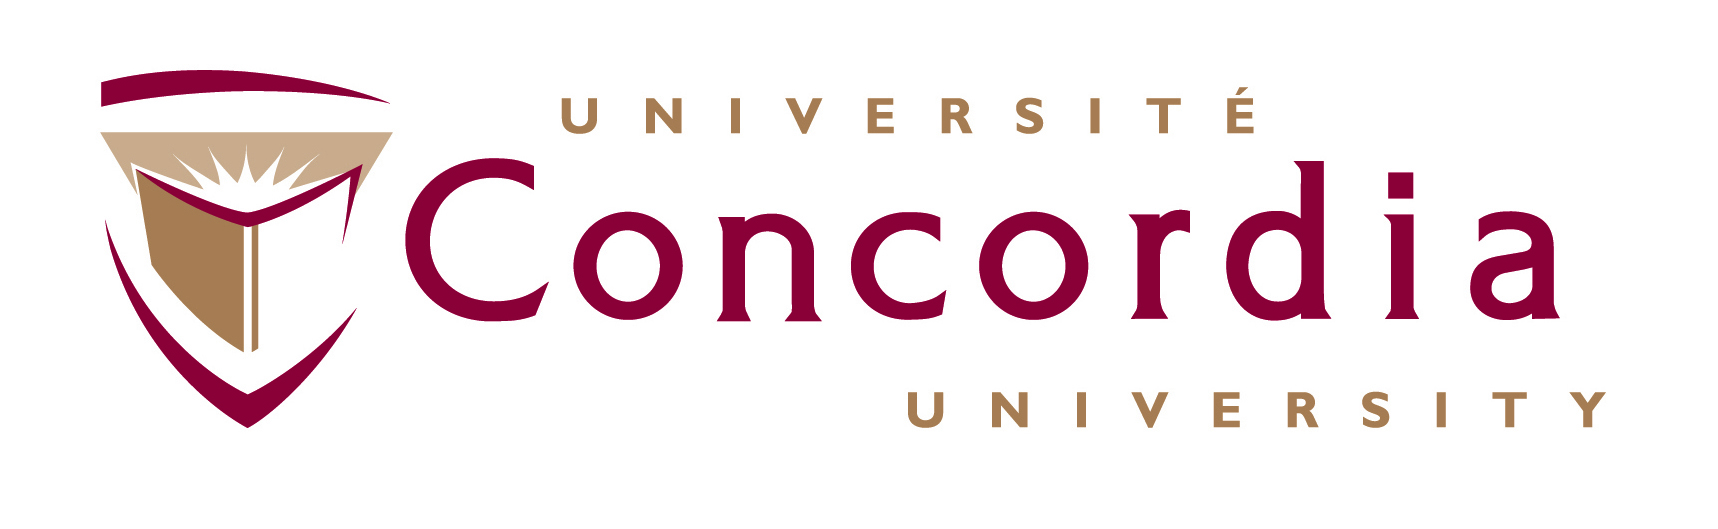 Concordia-logo